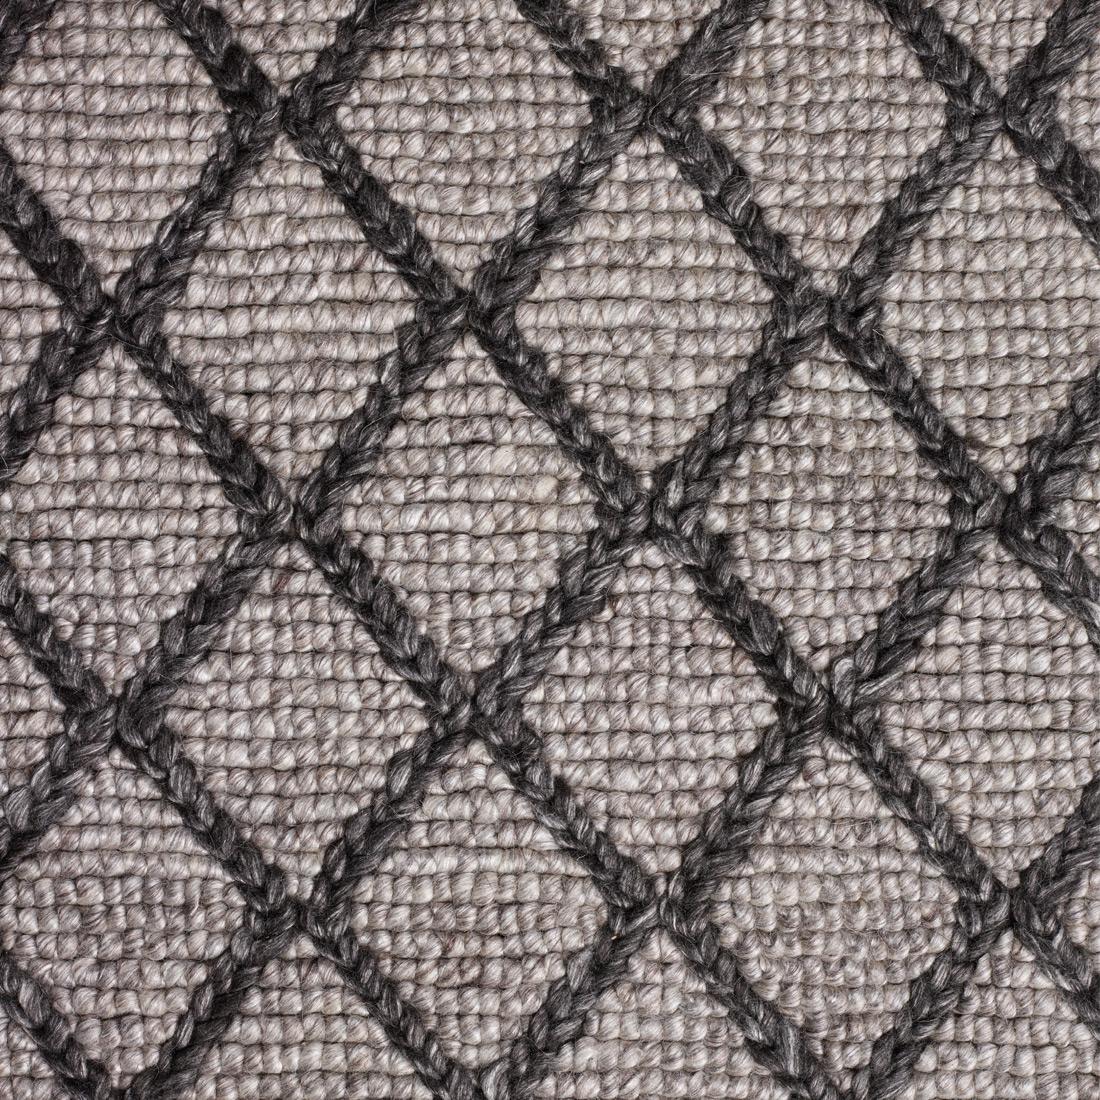 Vloerkleed Xilento Maestro Grey Black | 200 x 300 cm